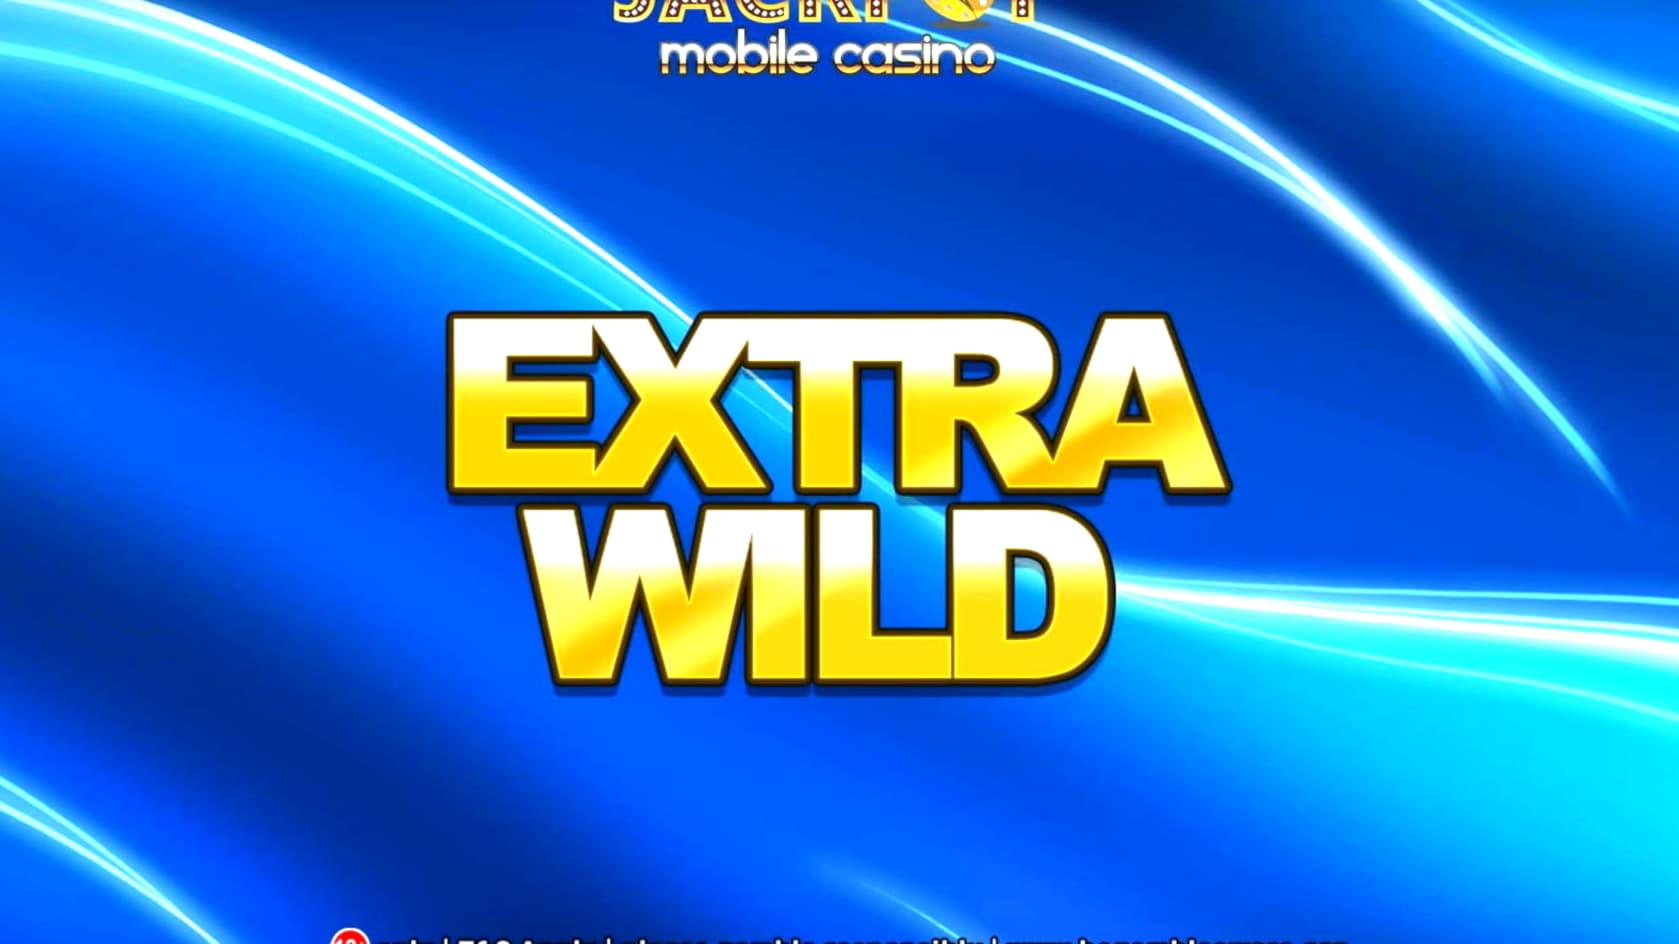 $55 Mobile freeroll slot tournament at Dafa Bet Casino